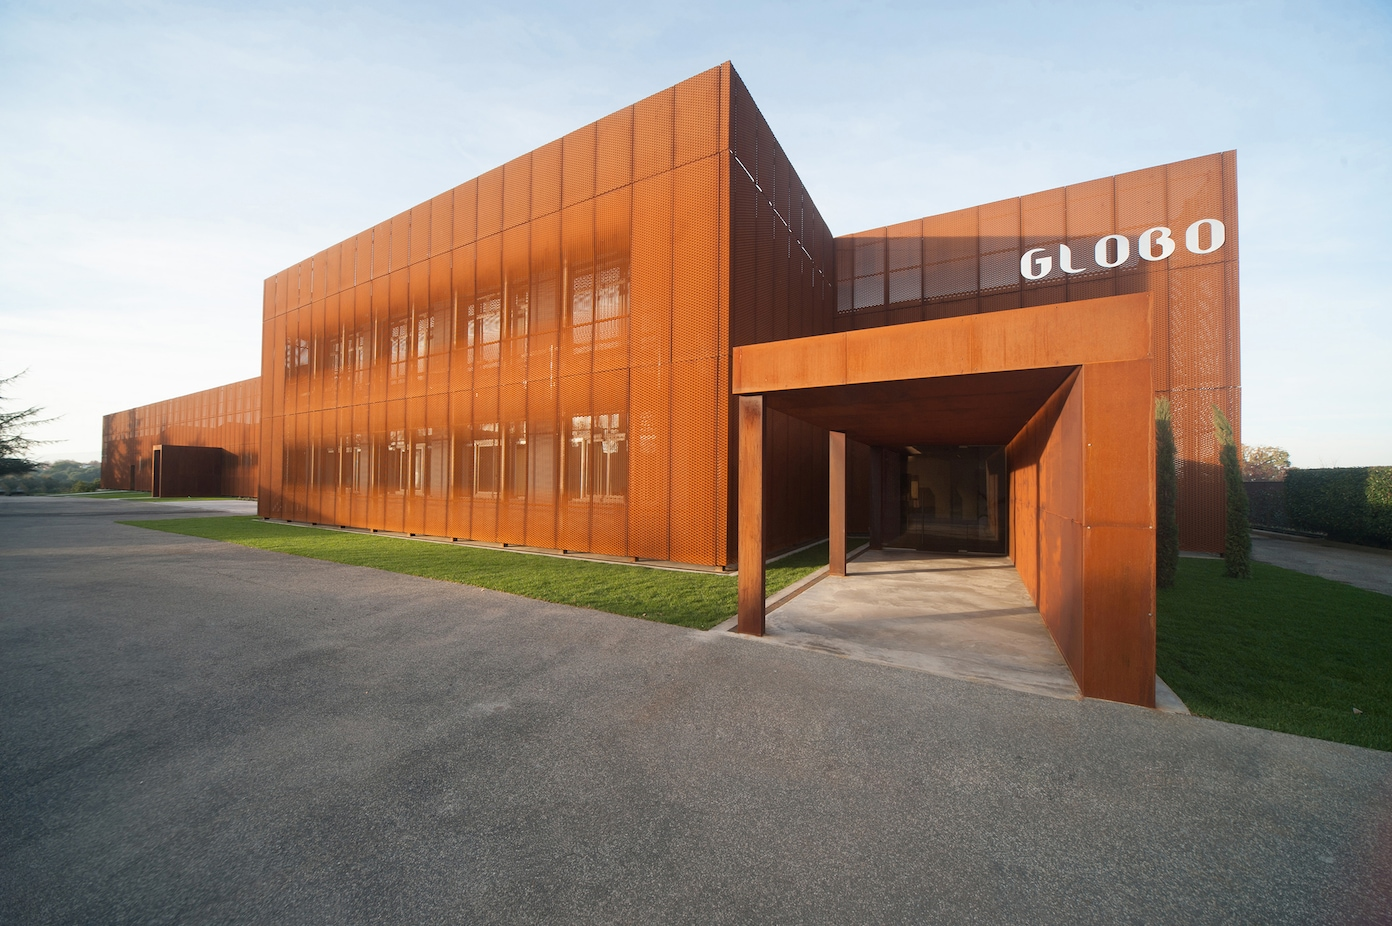 Ceramica Globo Space Stone.New Image For Ceramica Globo Headquarters Interni Magazine